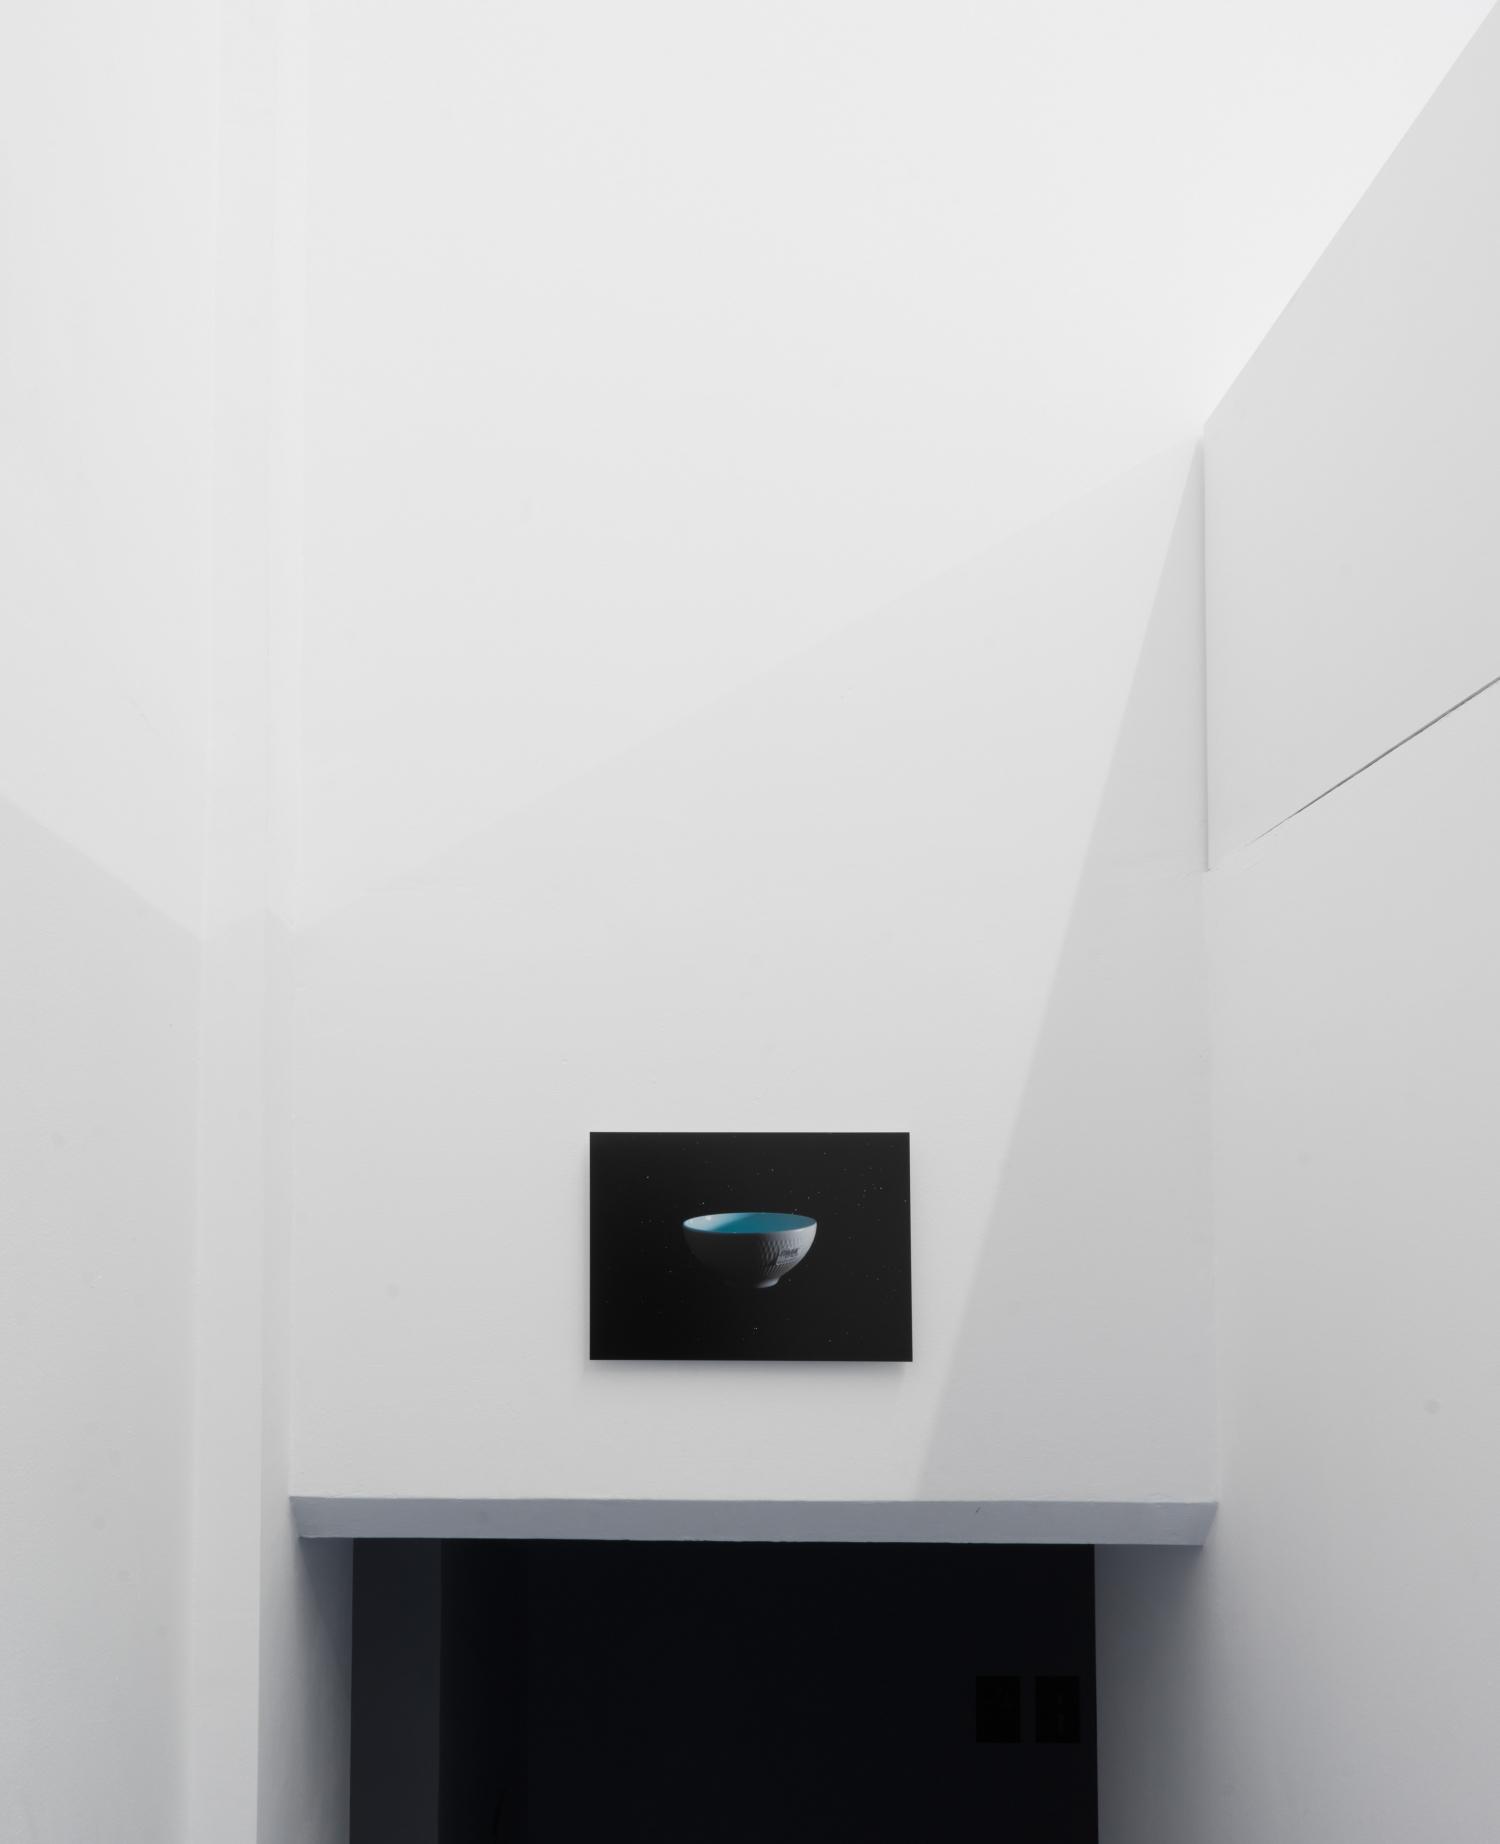 Utopia (2018) Inject print on semi-gloss paper; bonded on 3mm Dibond - 35x25cm